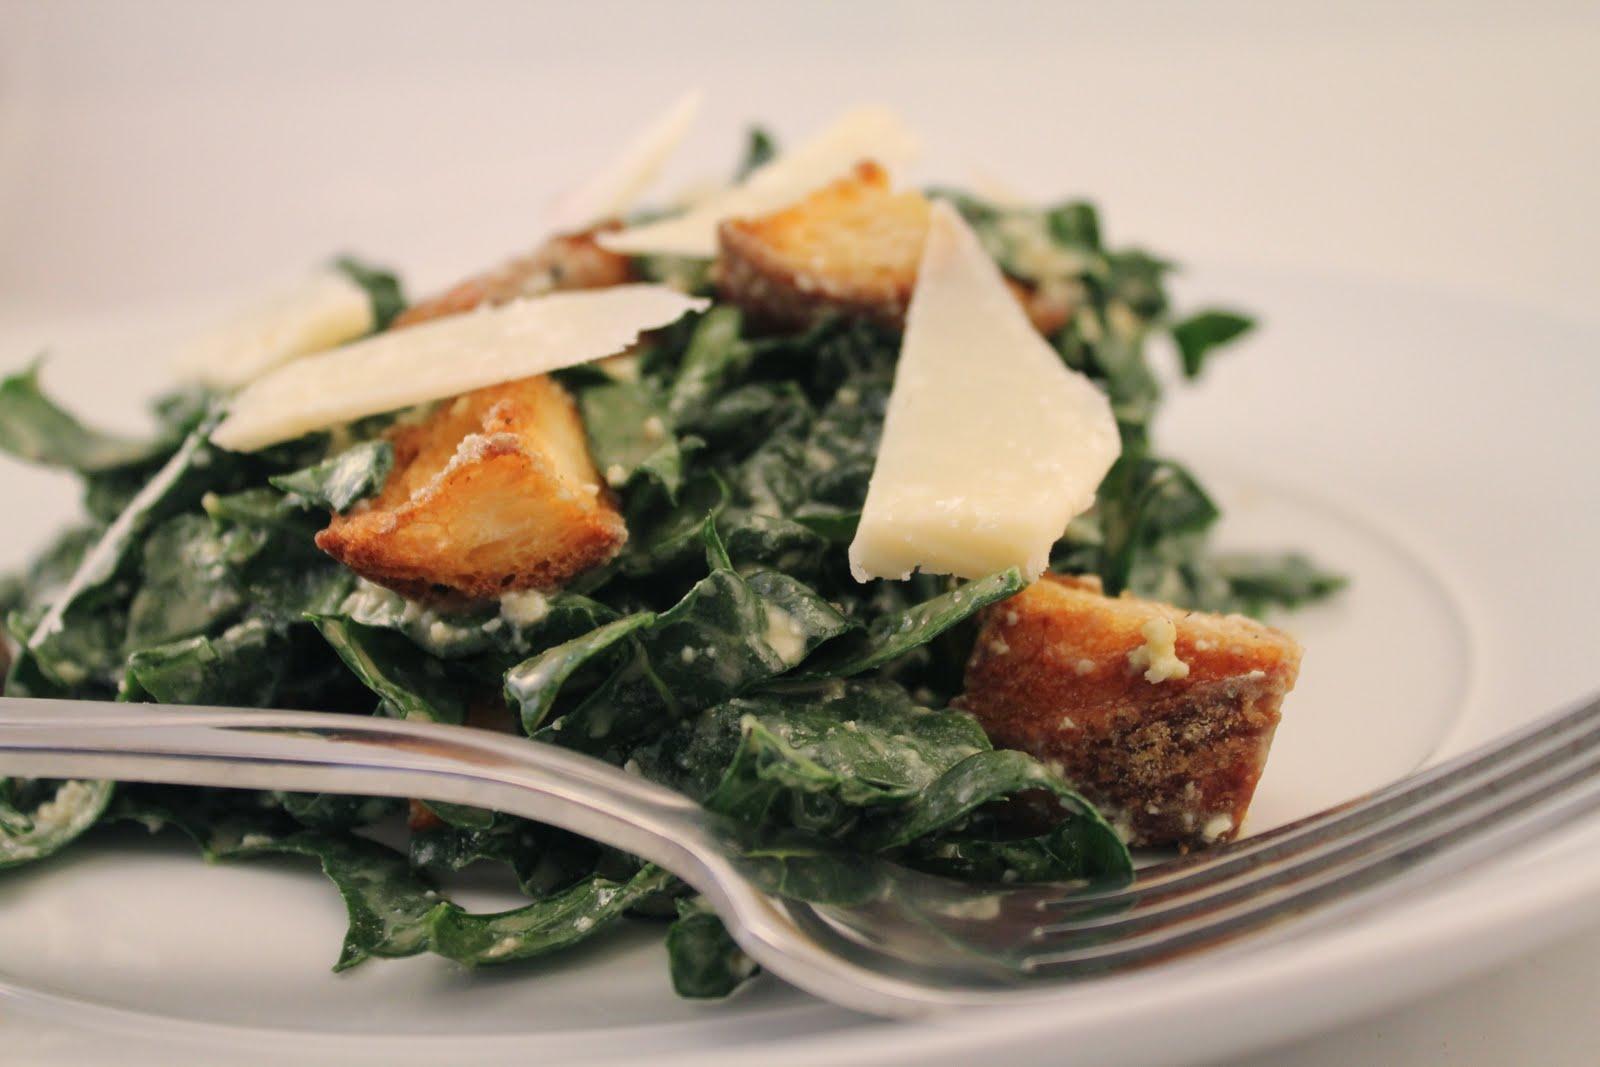 Simply Scrumptious: Kale Caesar Salad